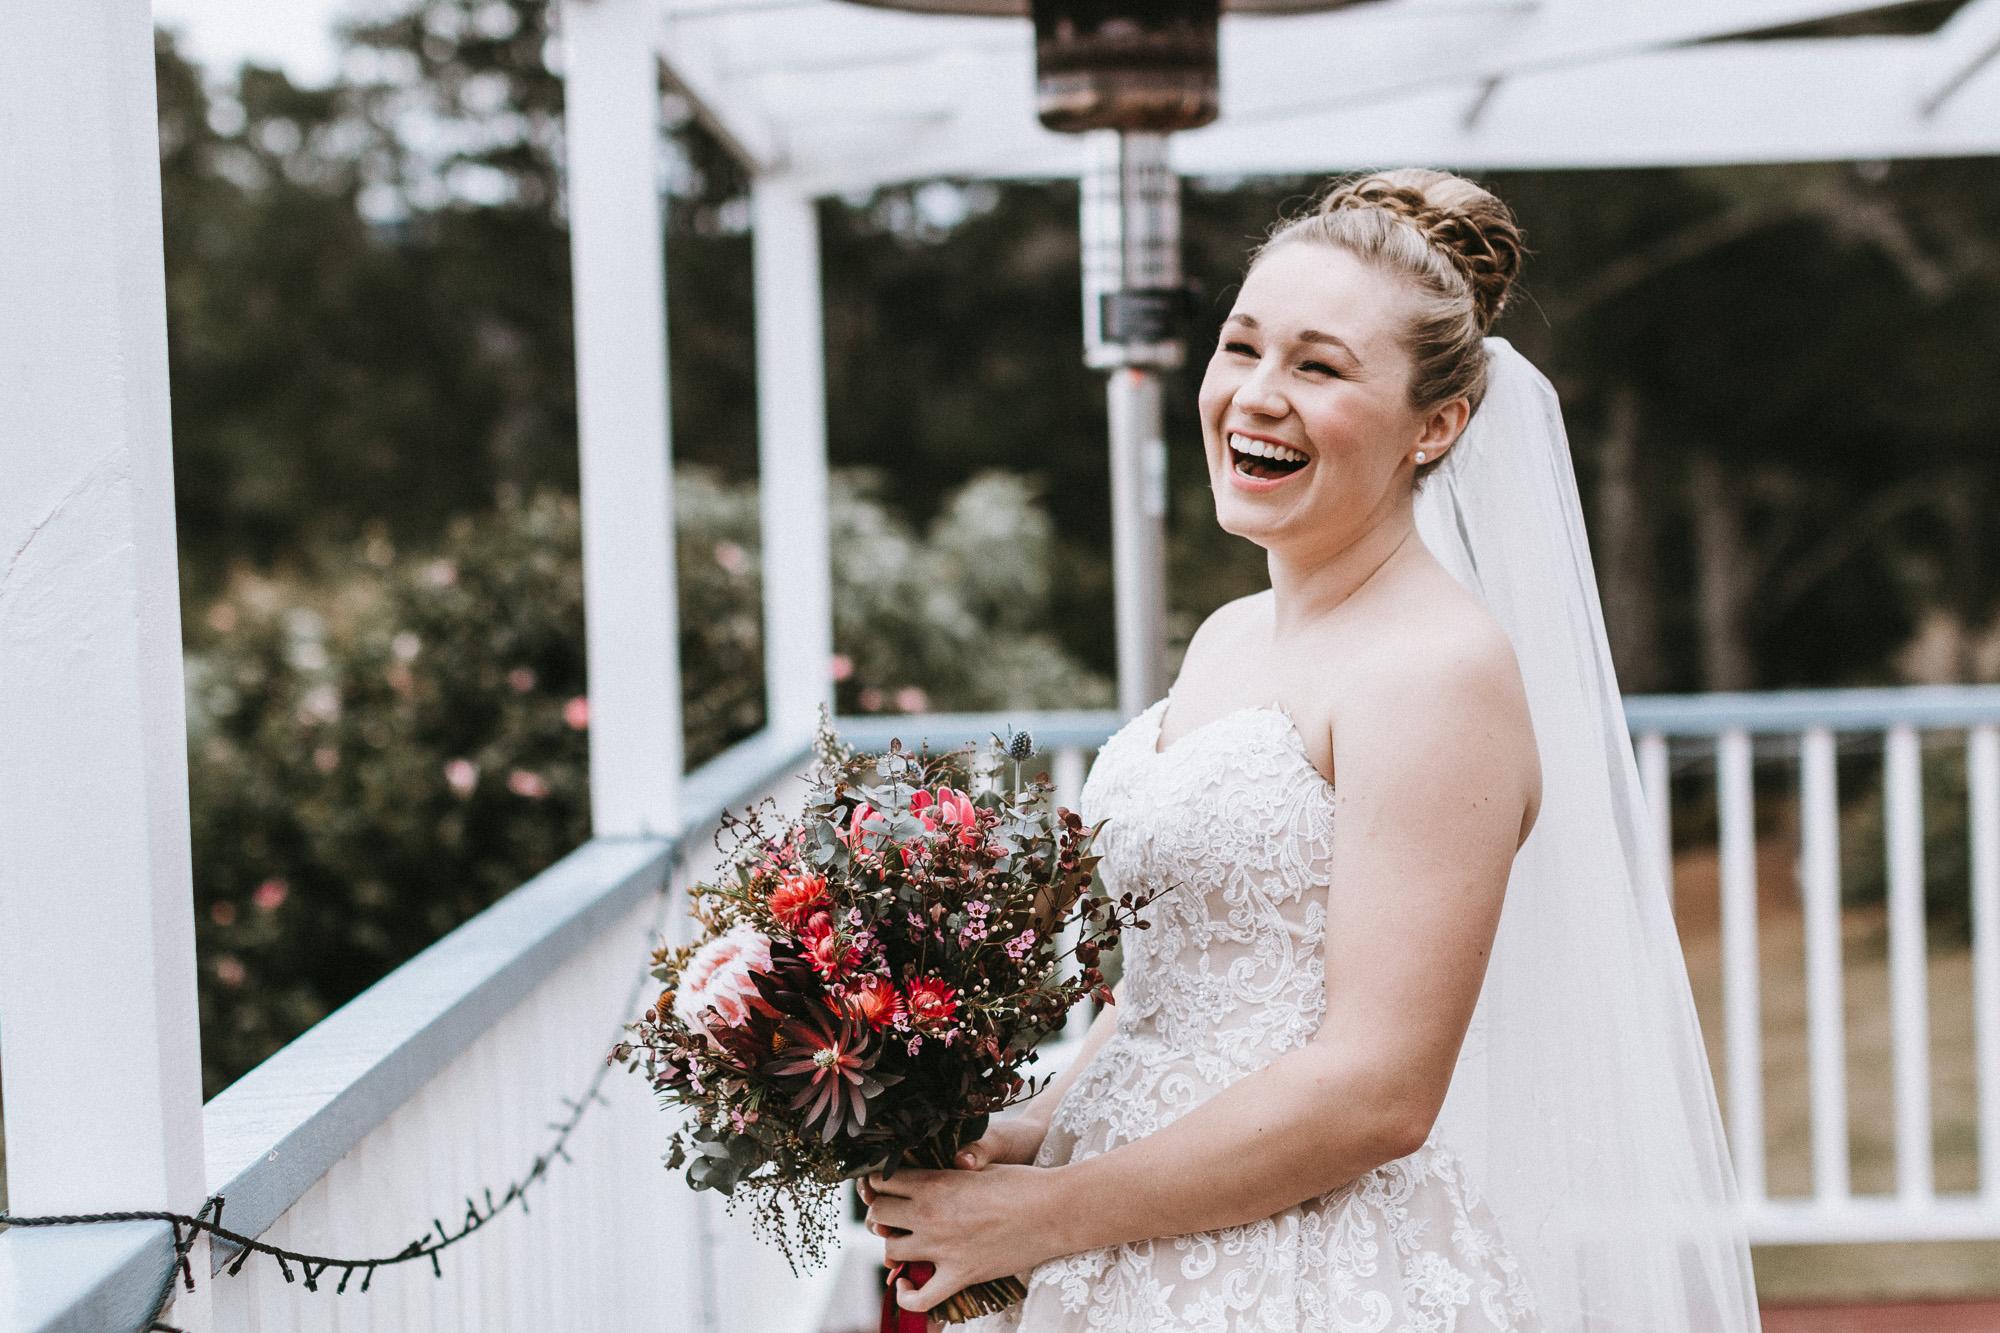 Sydney Wedding Photography / Wazza Studio